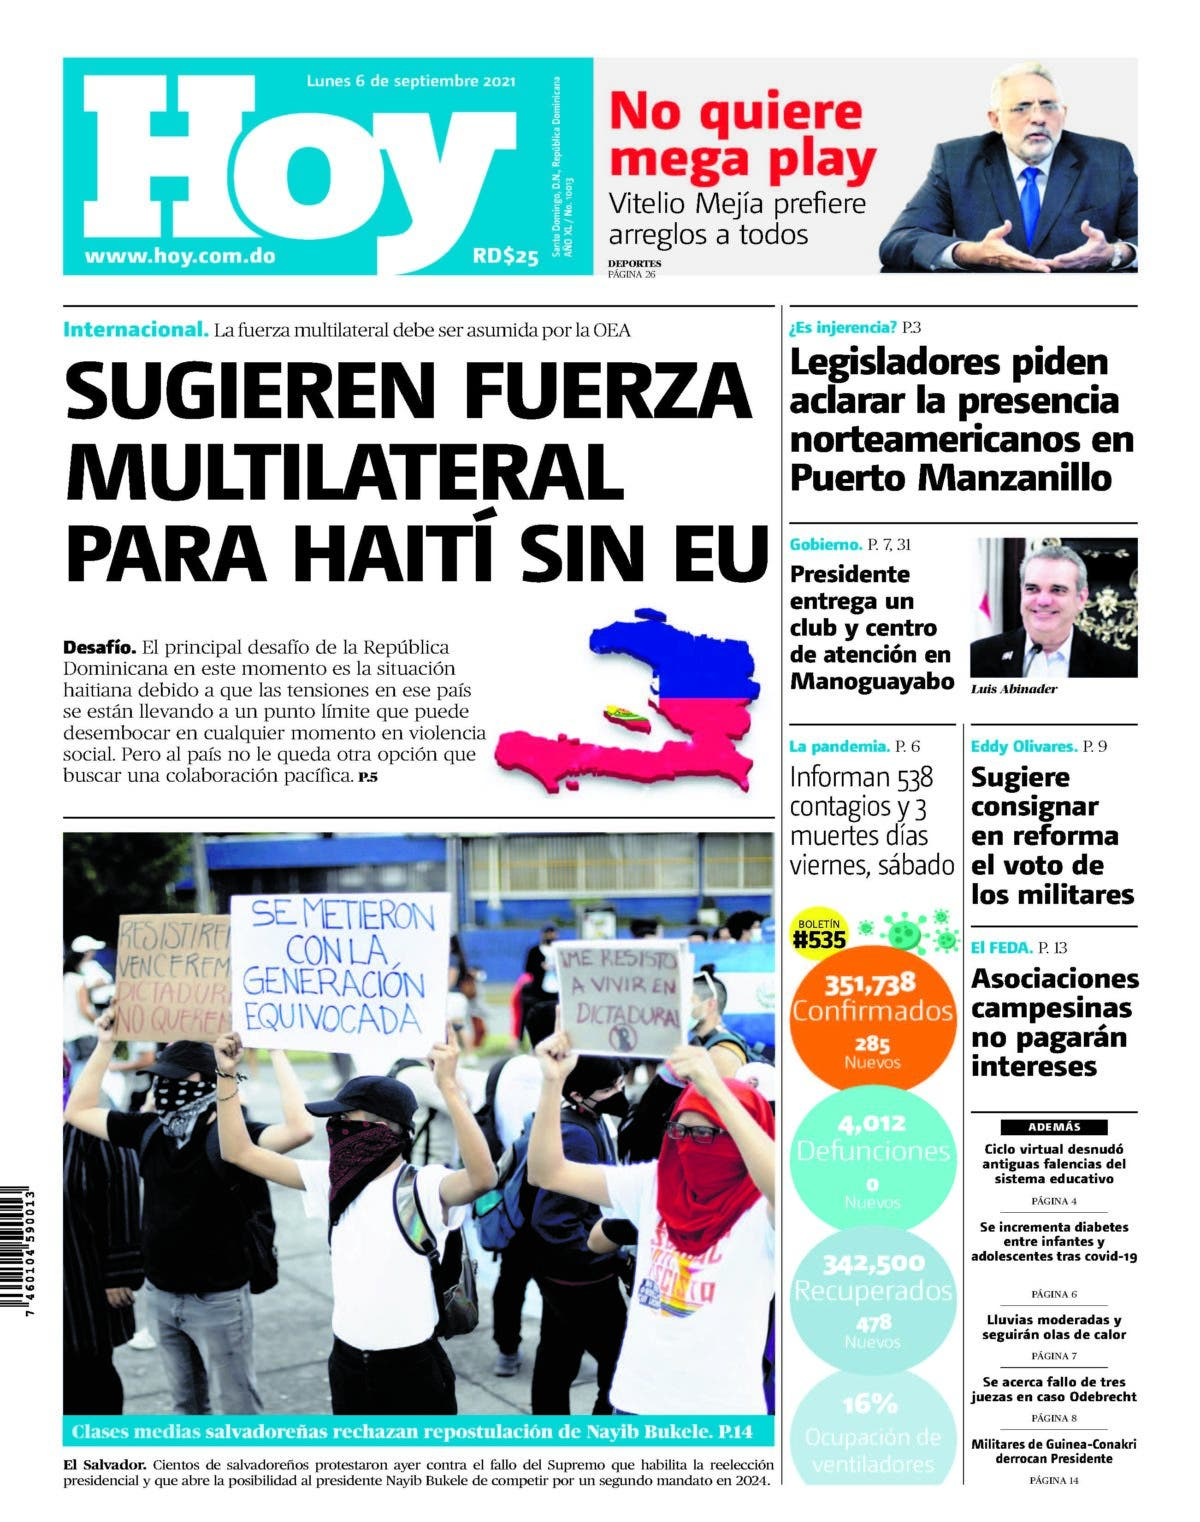 Edición impresa, HOY, lunes 06 de septiembre 2021